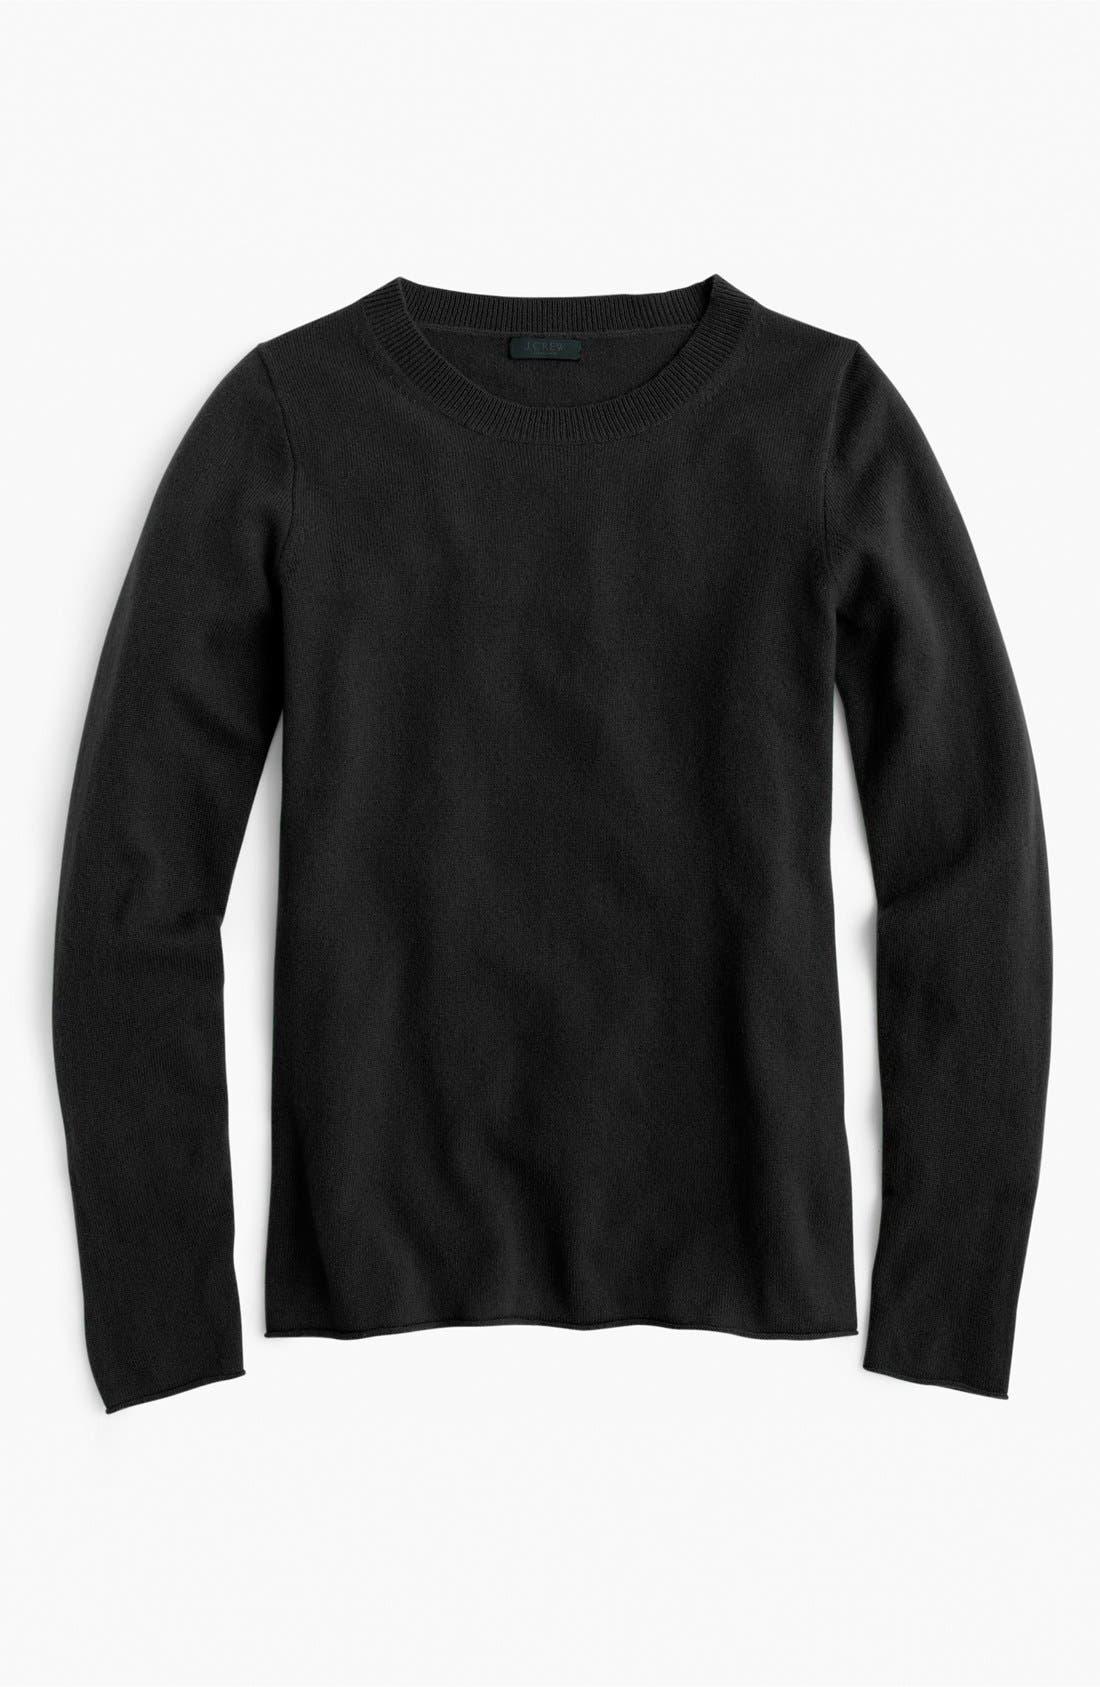 J.CREW,                             Long Sleeve Italian Cashmere Sweater,                             Main thumbnail 1, color,                             001